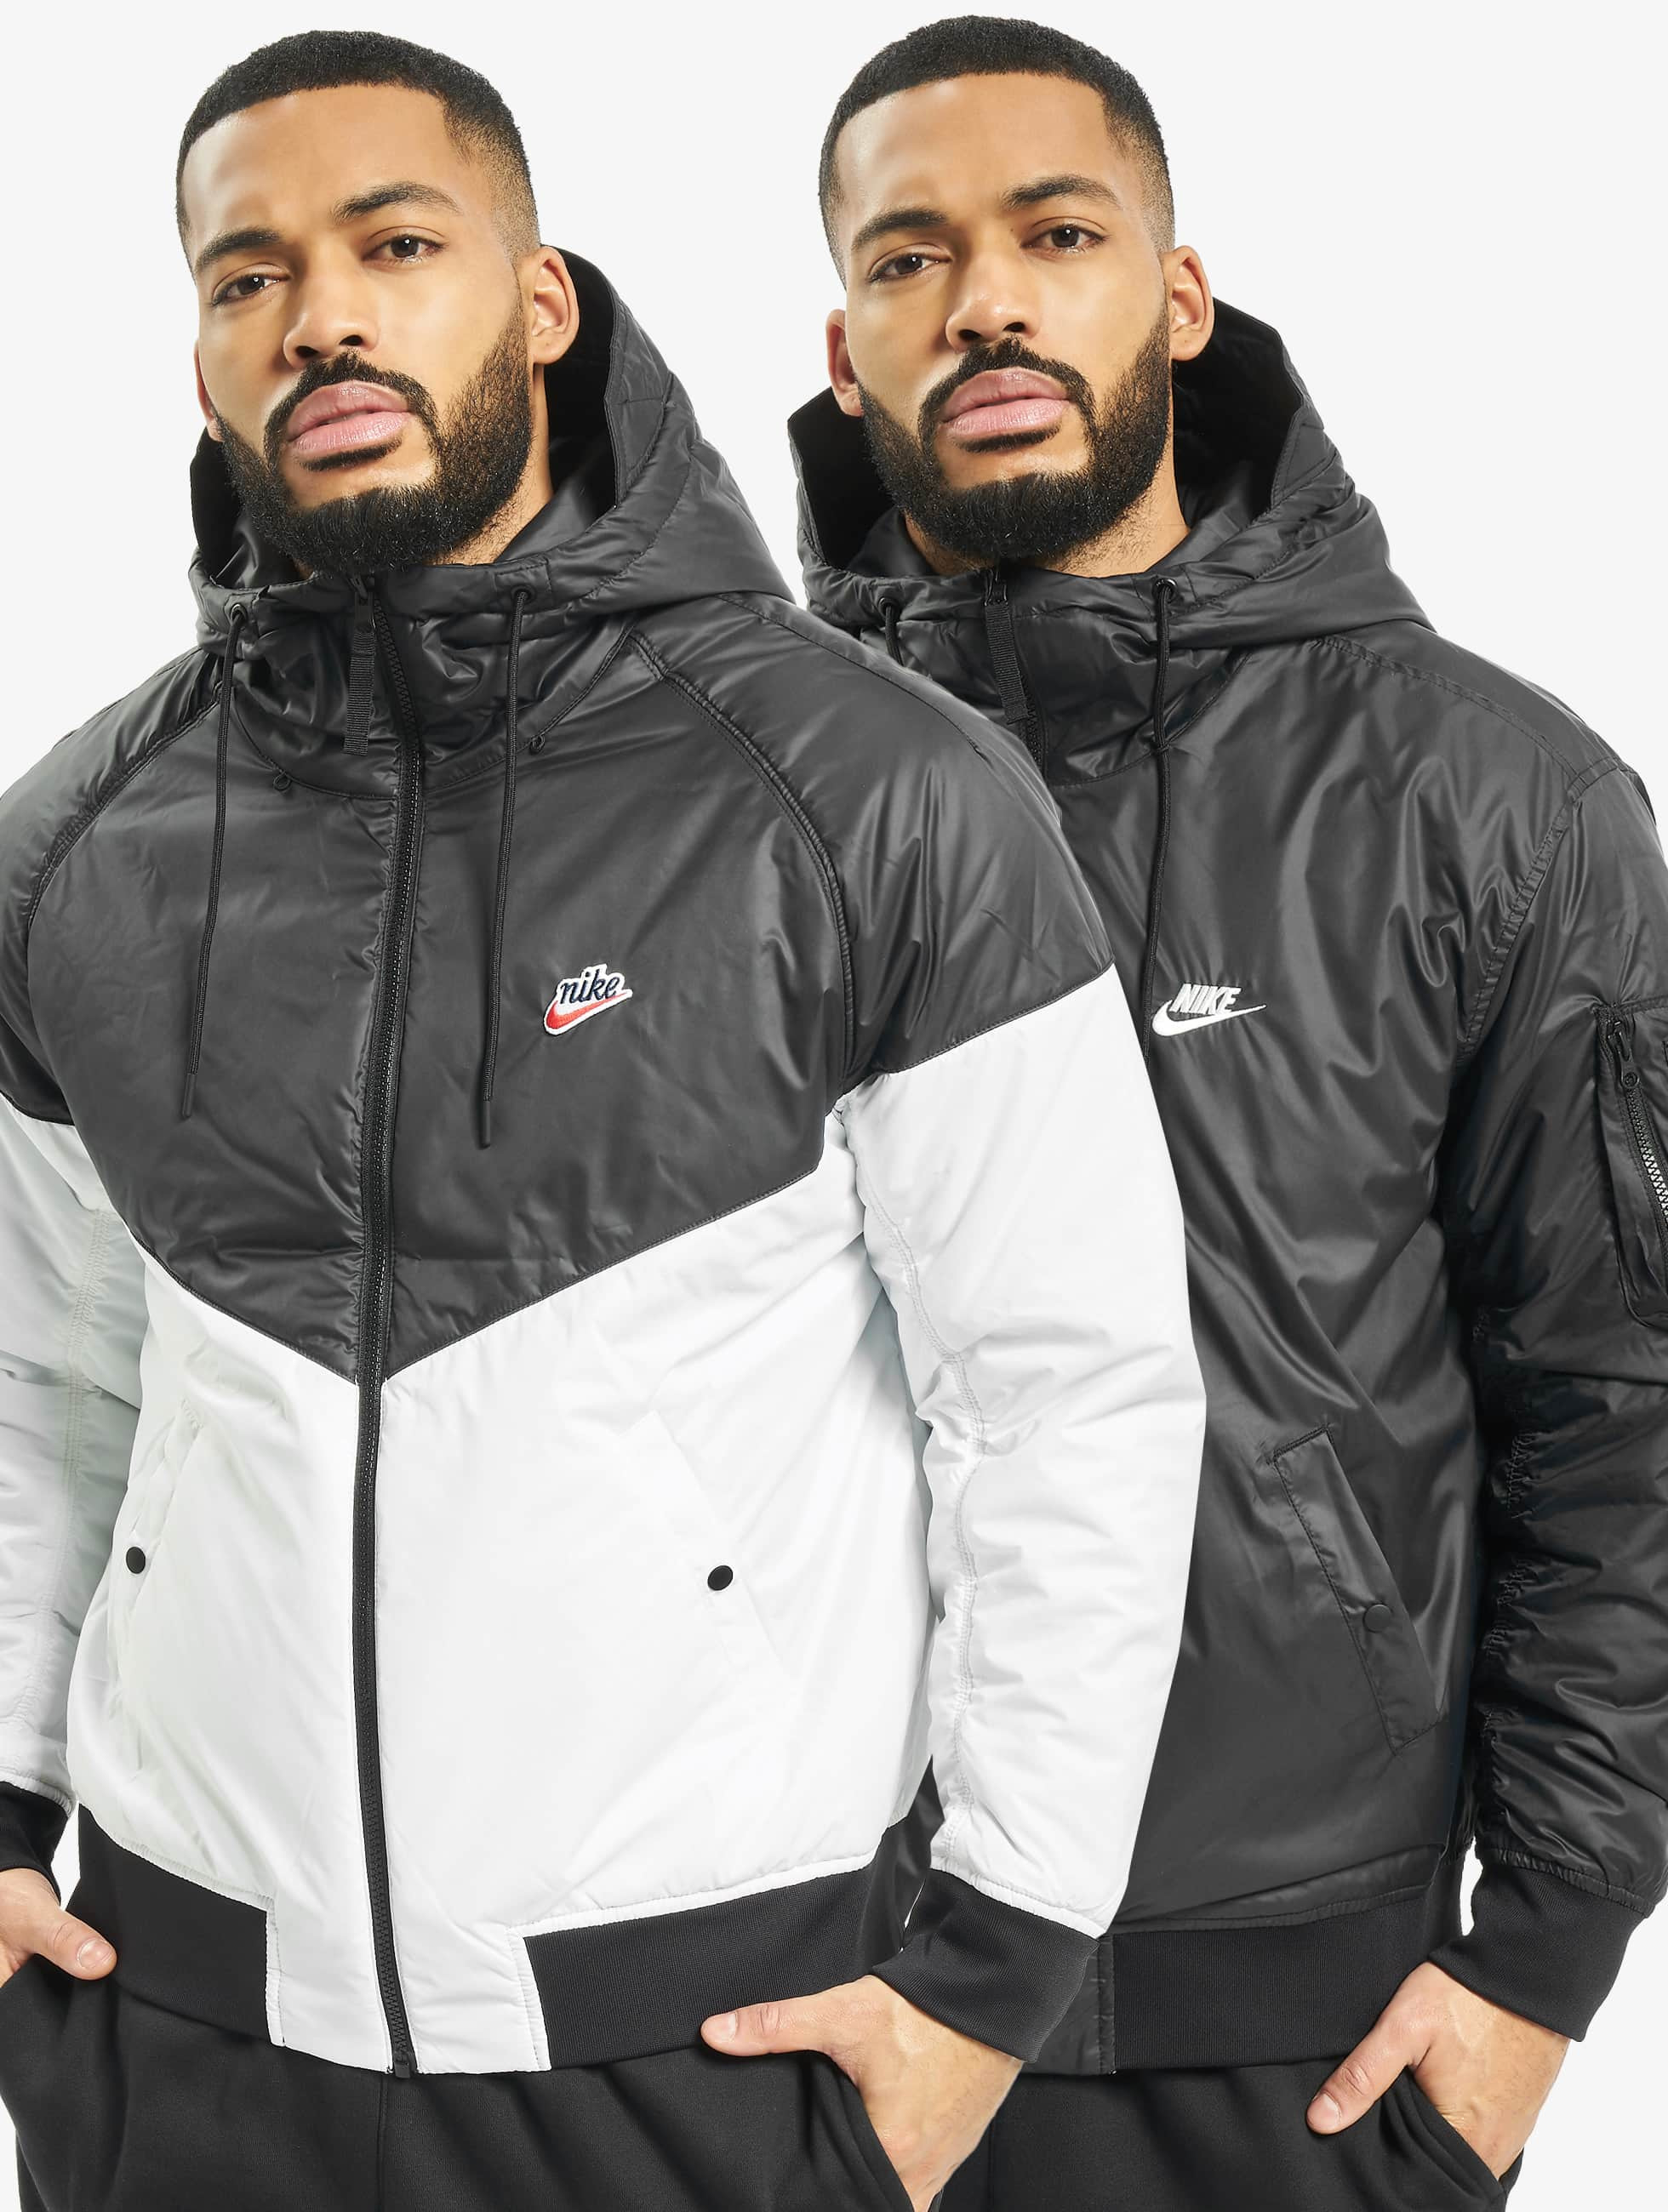 Nike Jackor Övergångsjackor HE i svart 715065